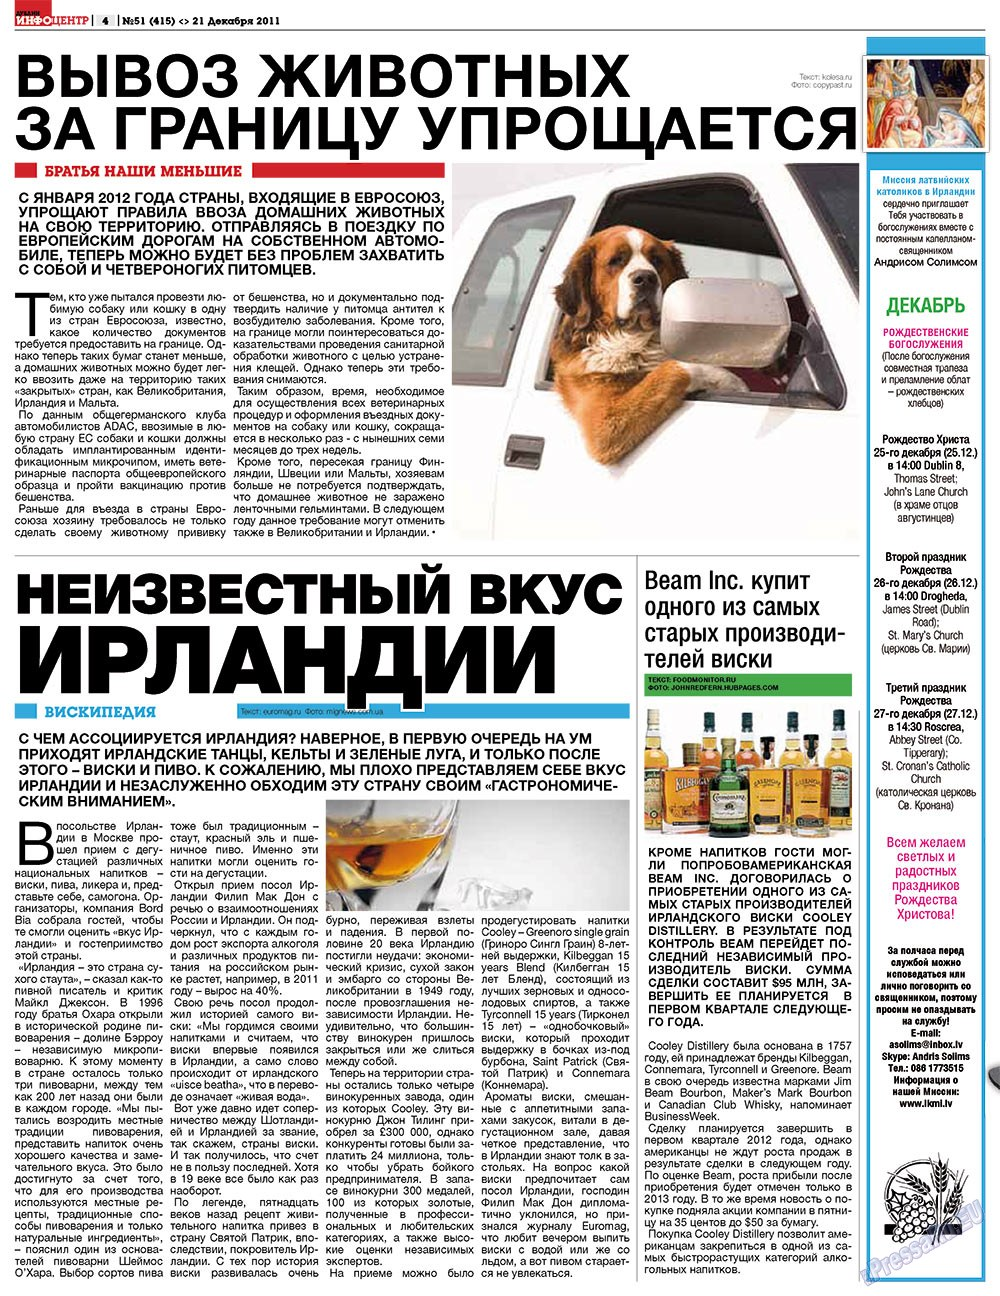 Дублин инфоцентр (газета). 2011 год, номер 51, стр. 4